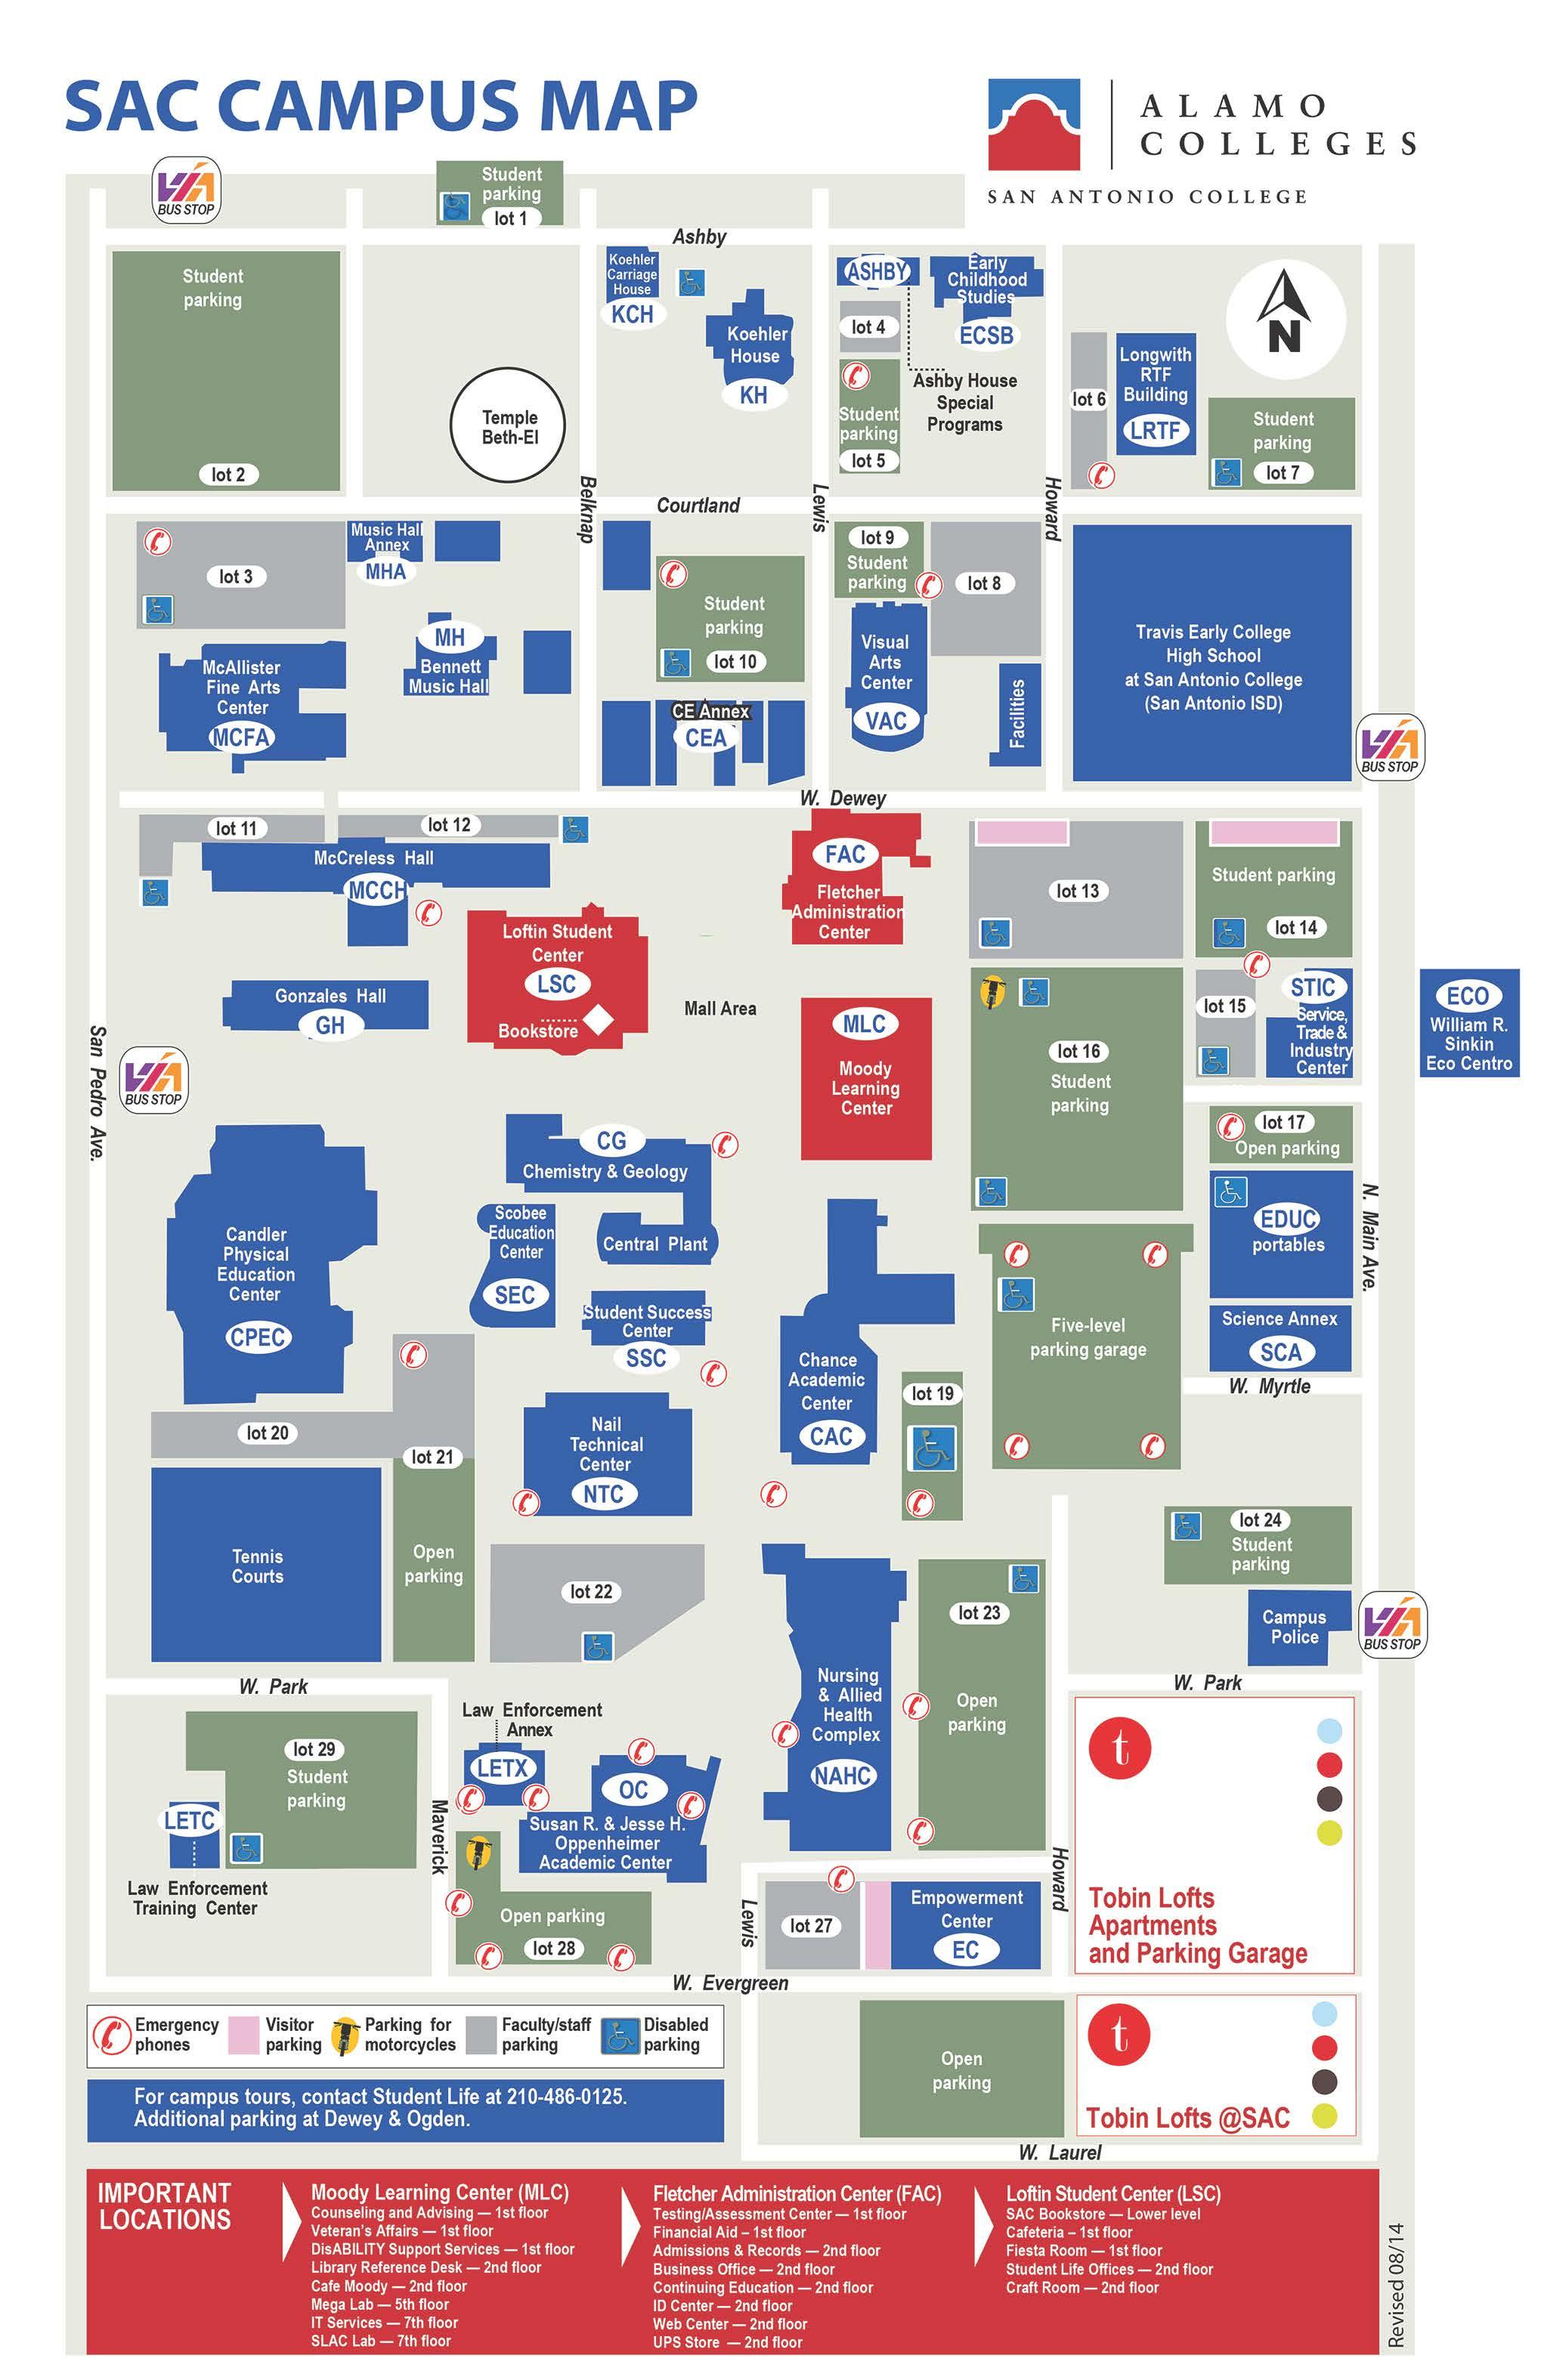 Sac Campus Map Sac Campus Map | compressportnederland Sac Campus Map